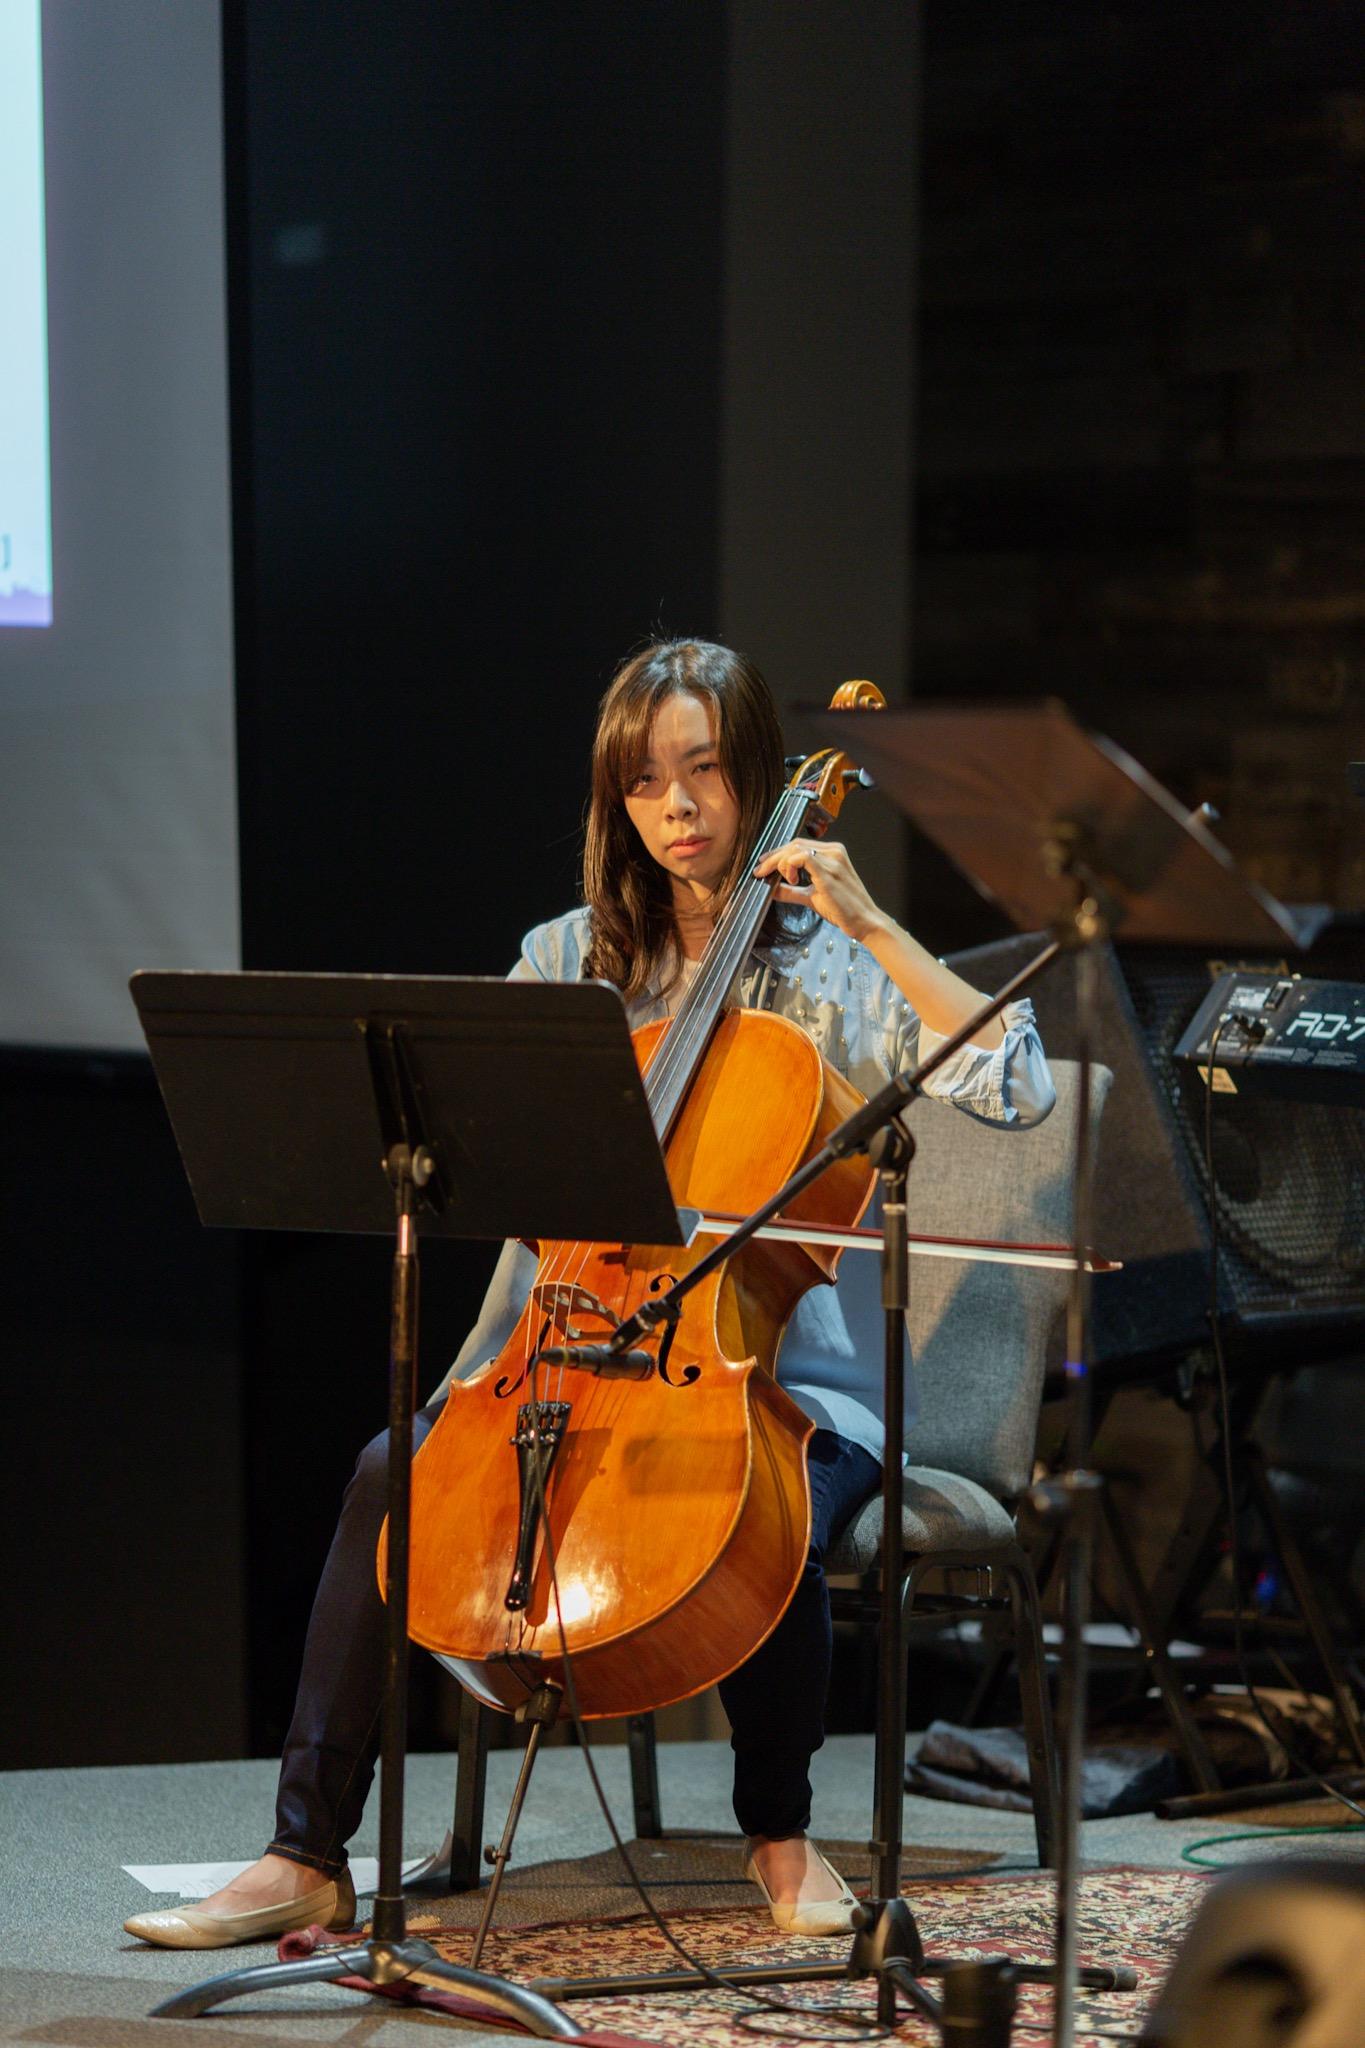 Iris the cellist